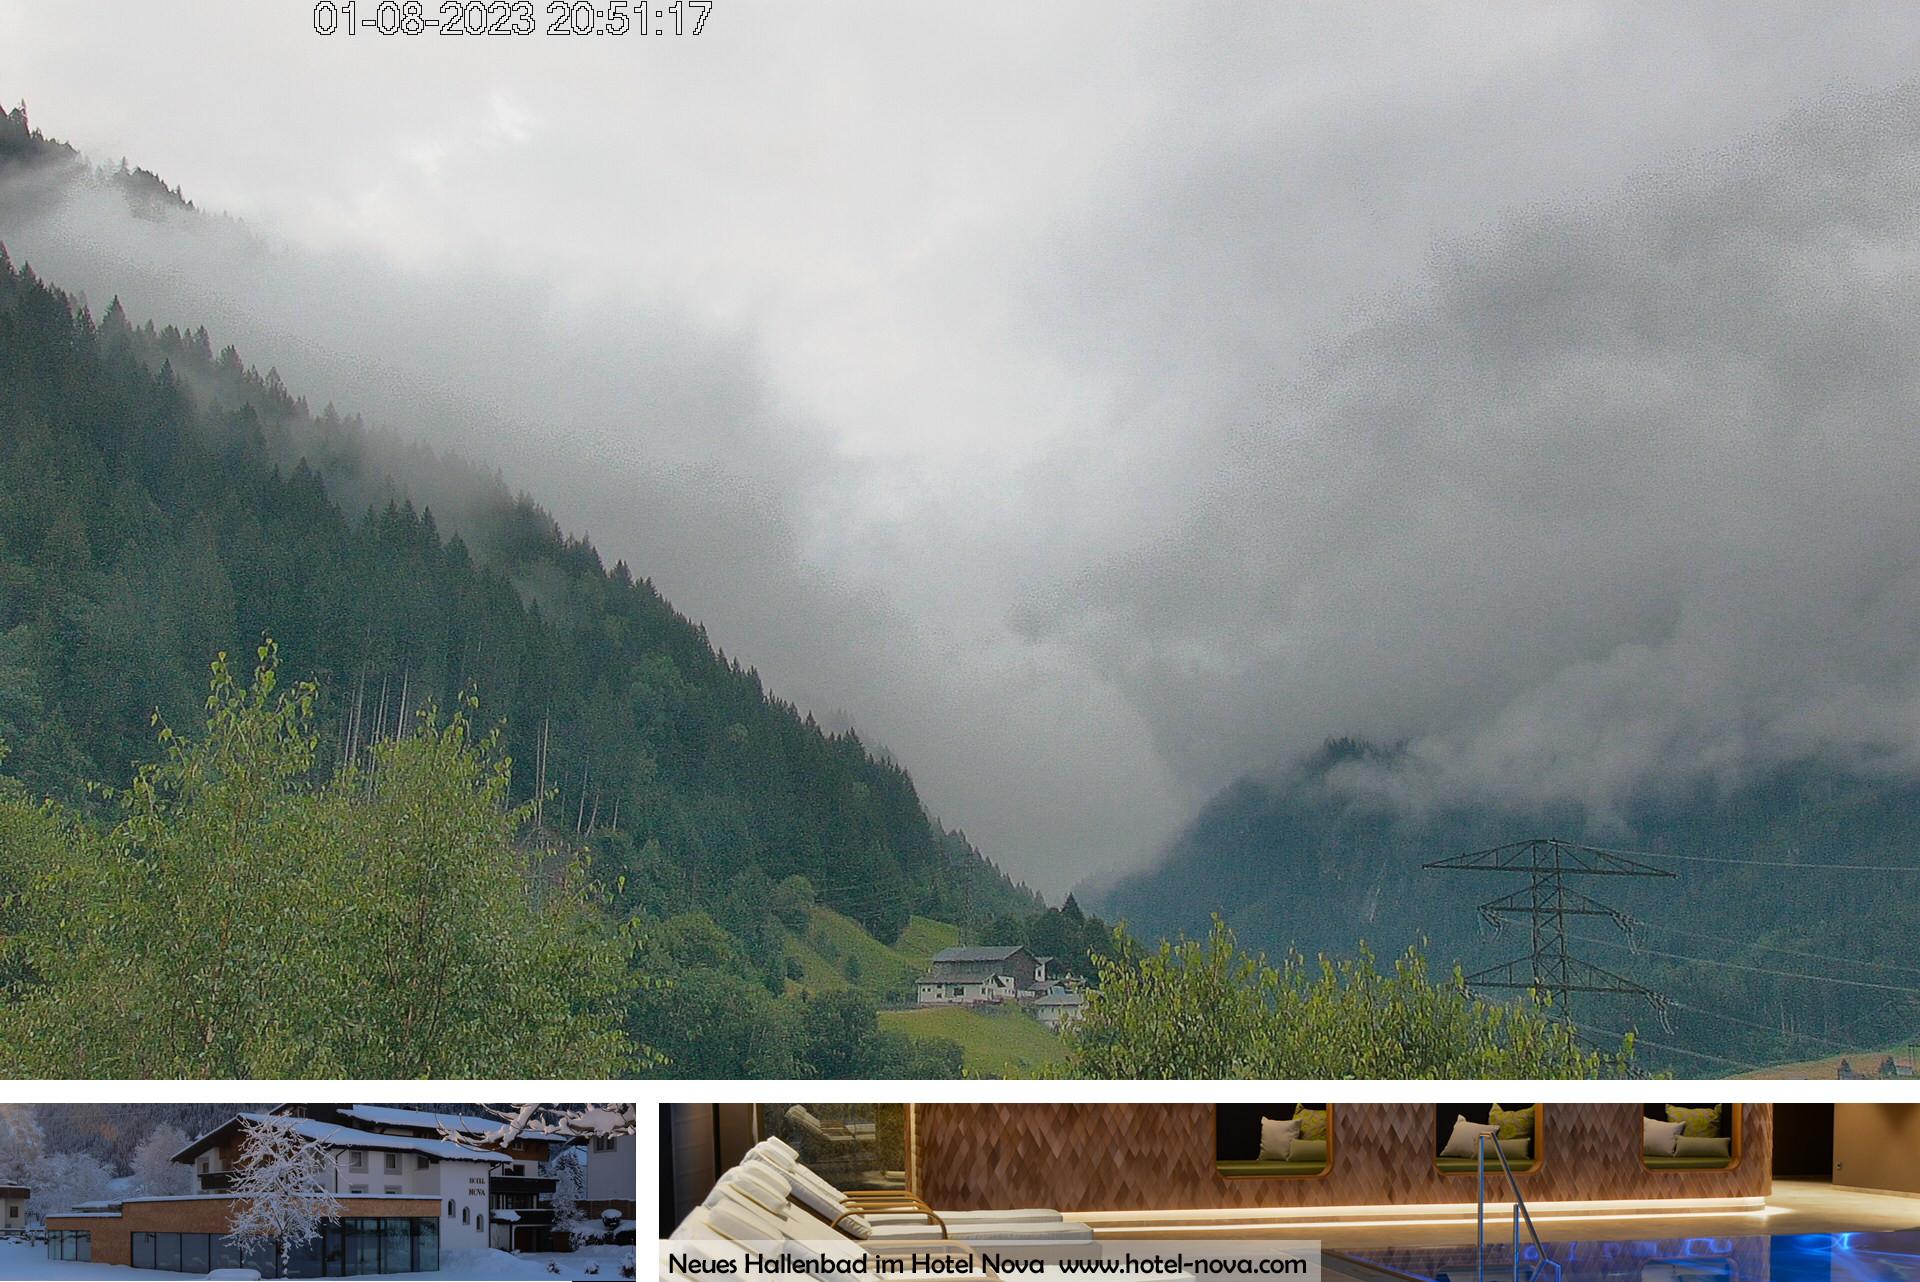 Panorama Webcam Hotel Nova an der Silvretta - Blick auf die Zamangspitze